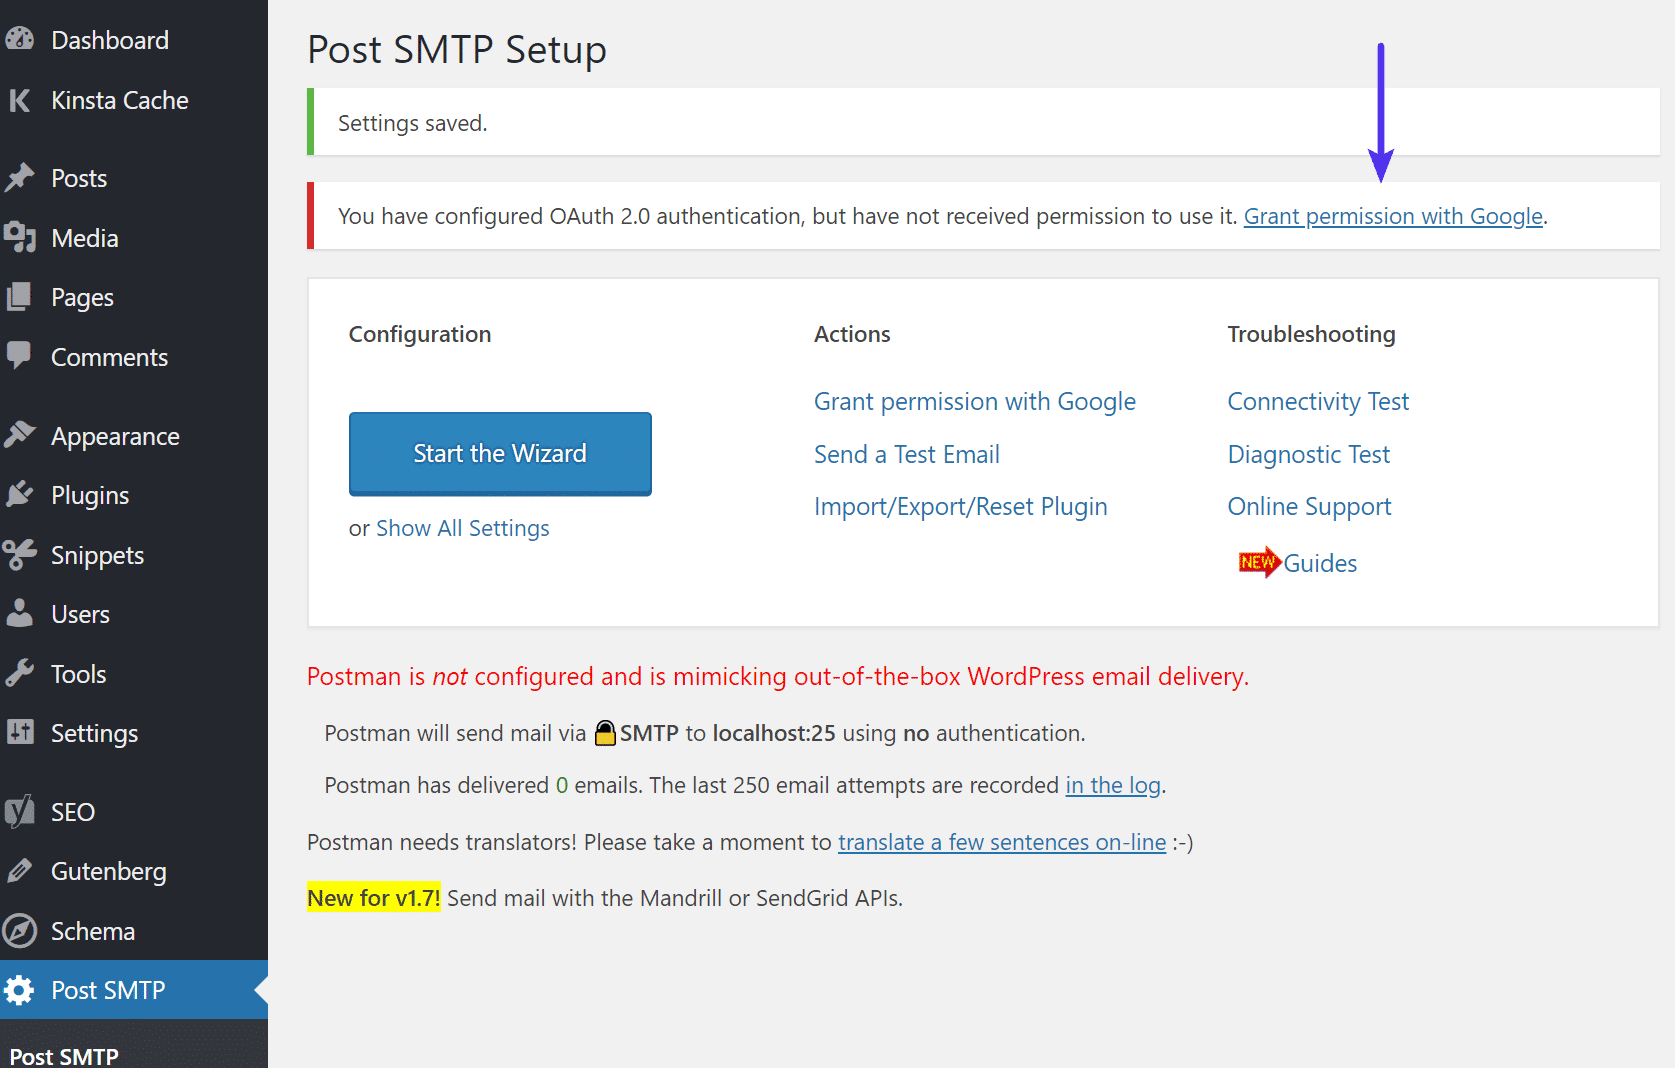 Assegnazione permessi Post SMTP